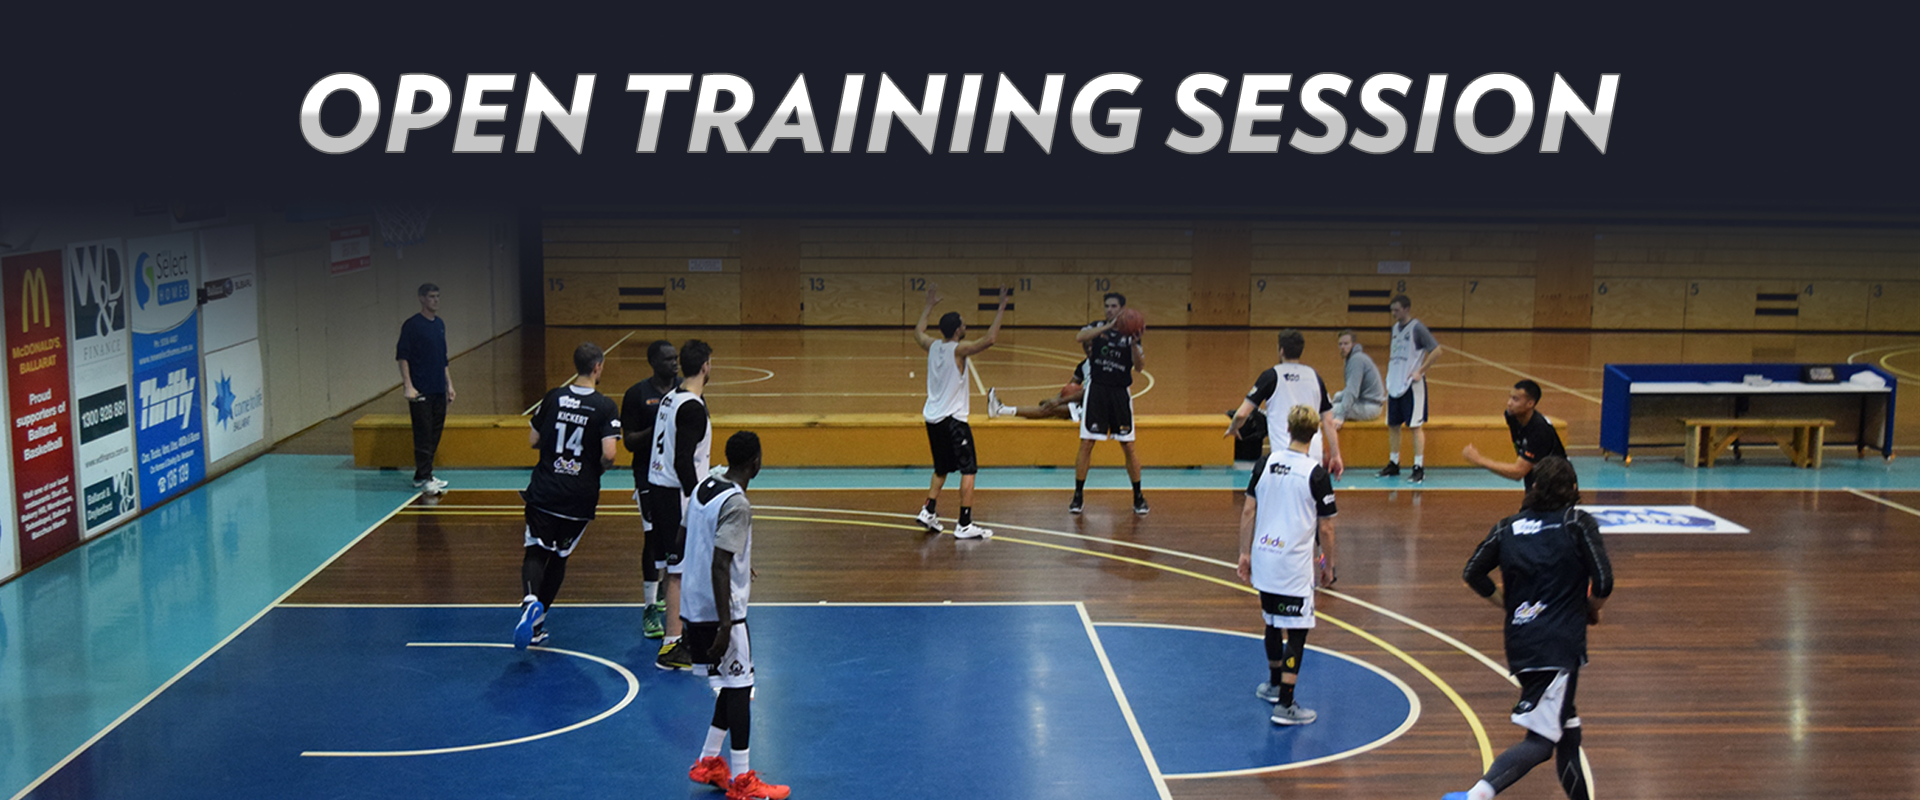 Basketball Sports Store Melbourne - Joe Maloy b3eed3f8e